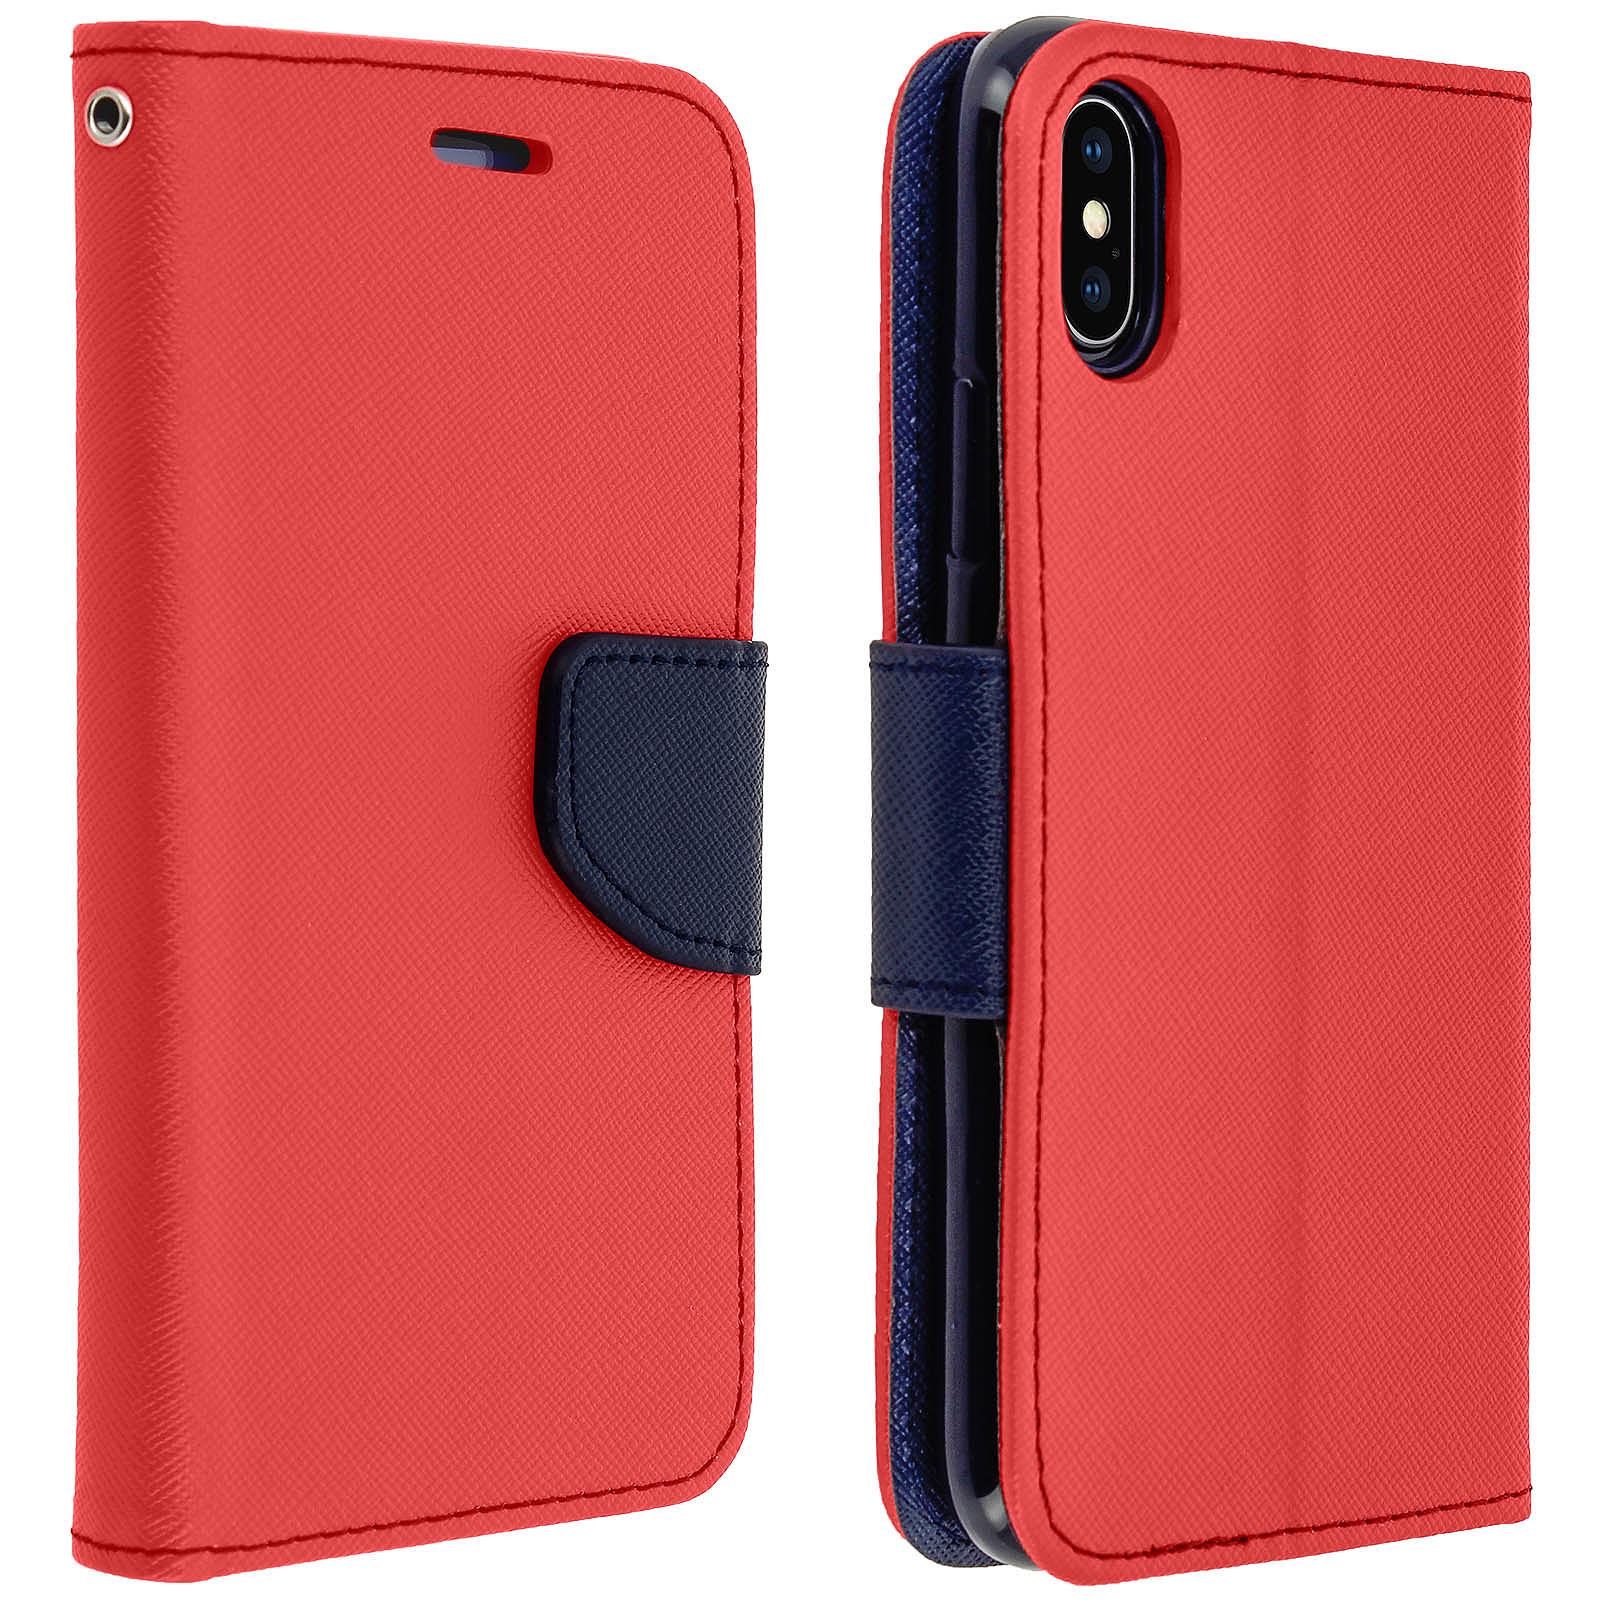 Avizar Etui folio Rouge Fancy Style pour Apple iPhone XS Max